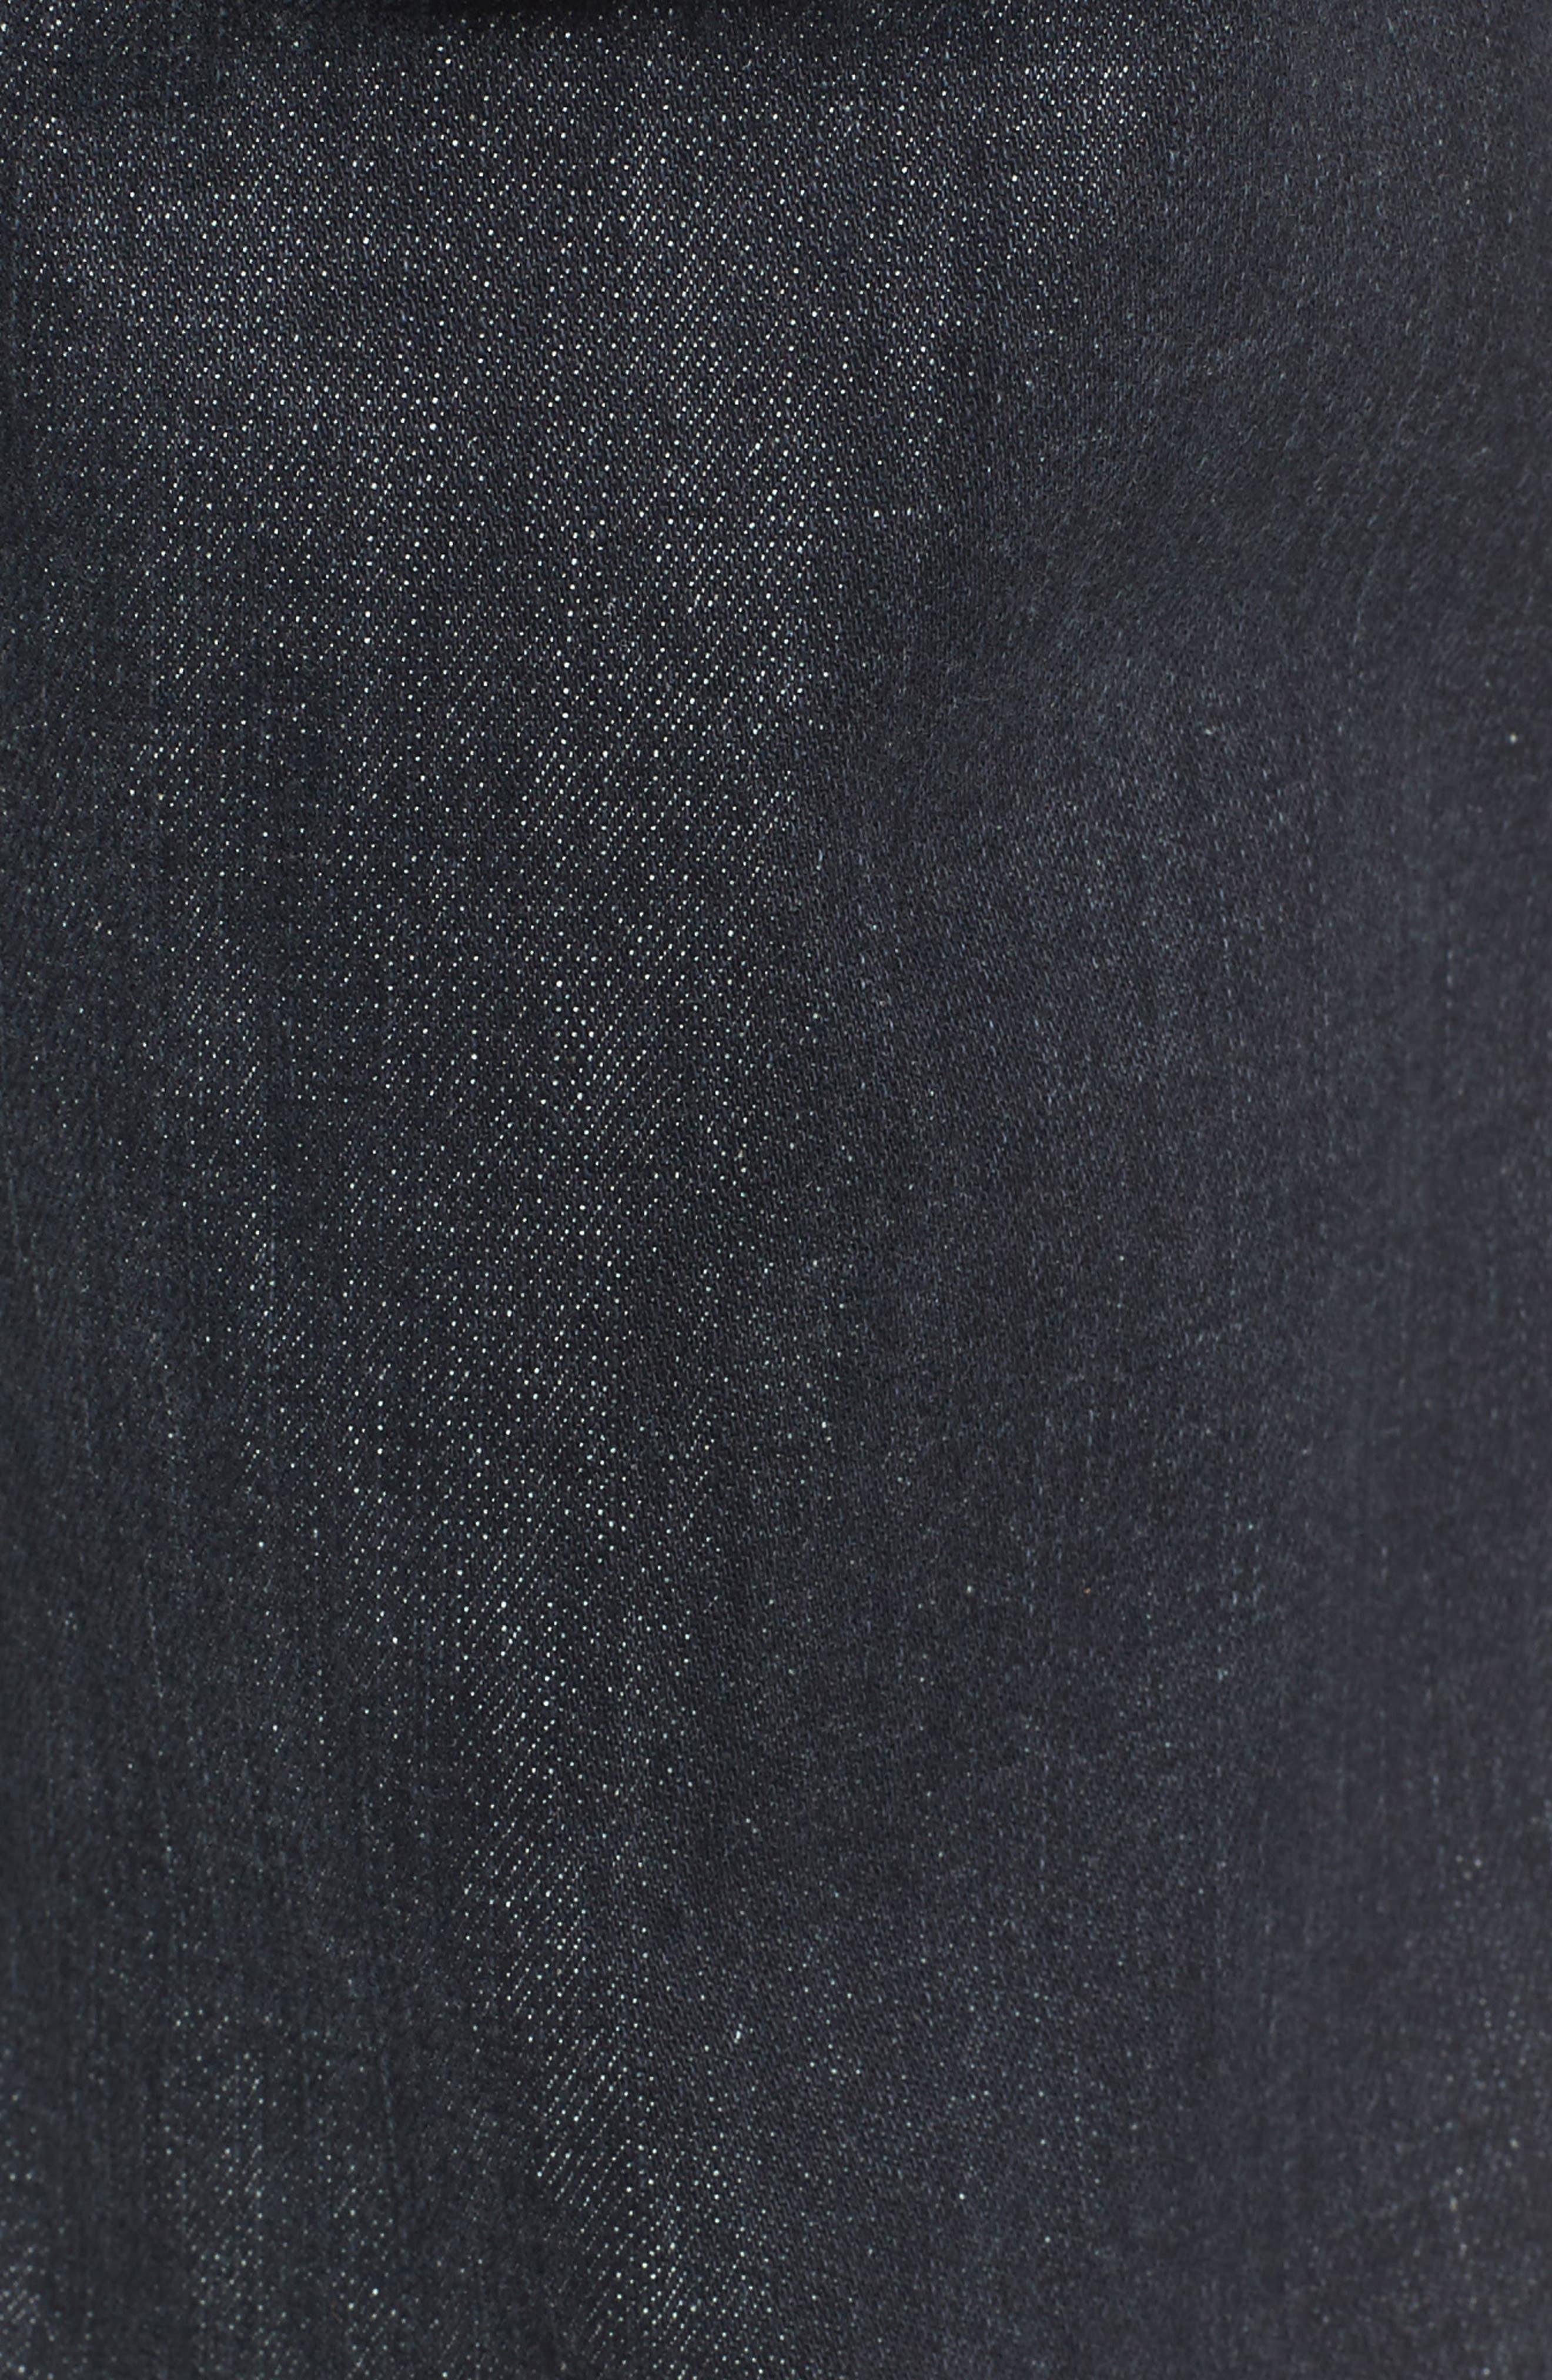 Blinder Skinny Fit Moto Jeans,                             Alternate thumbnail 5, color,                             001